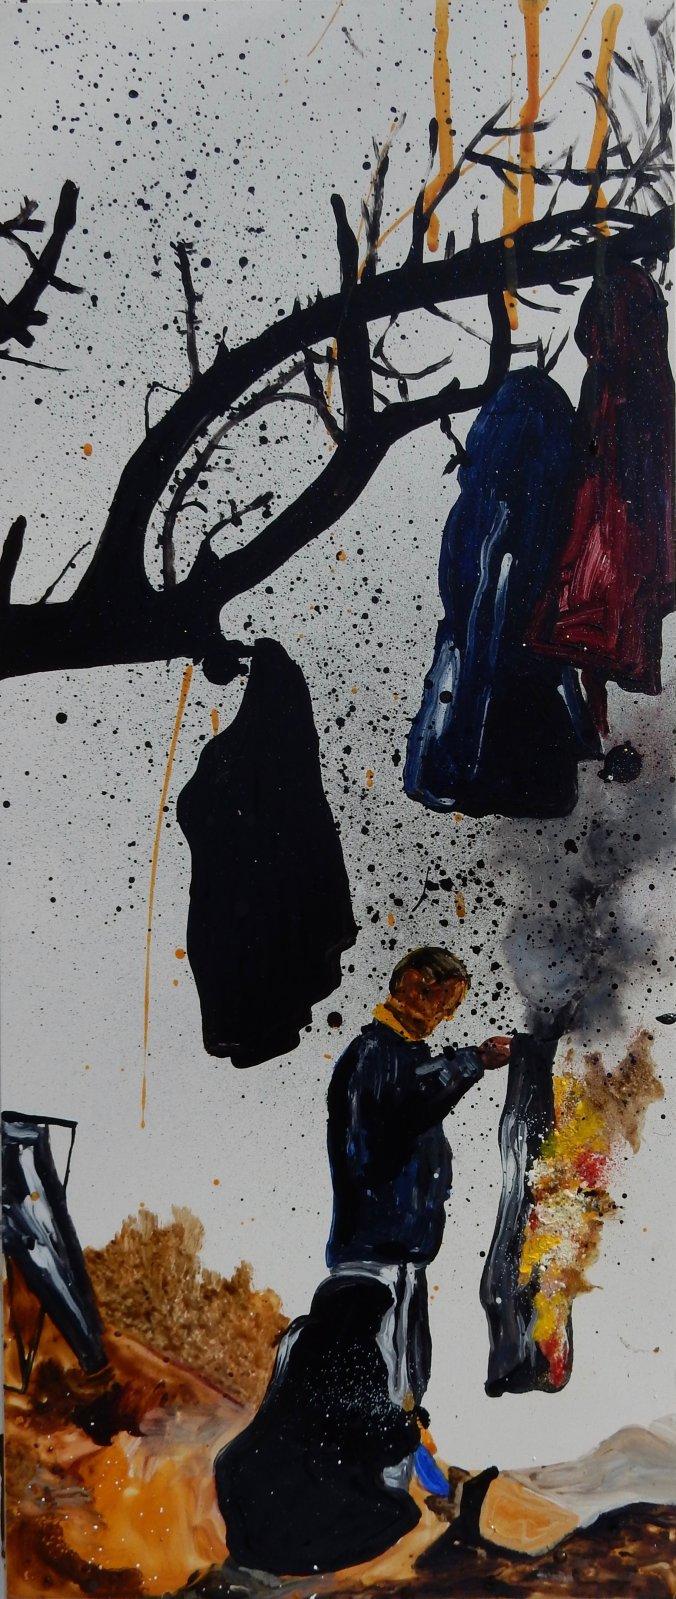 Man Burning his Trousers to Make a Bonfire (Greek/Macedonian Border) 2106